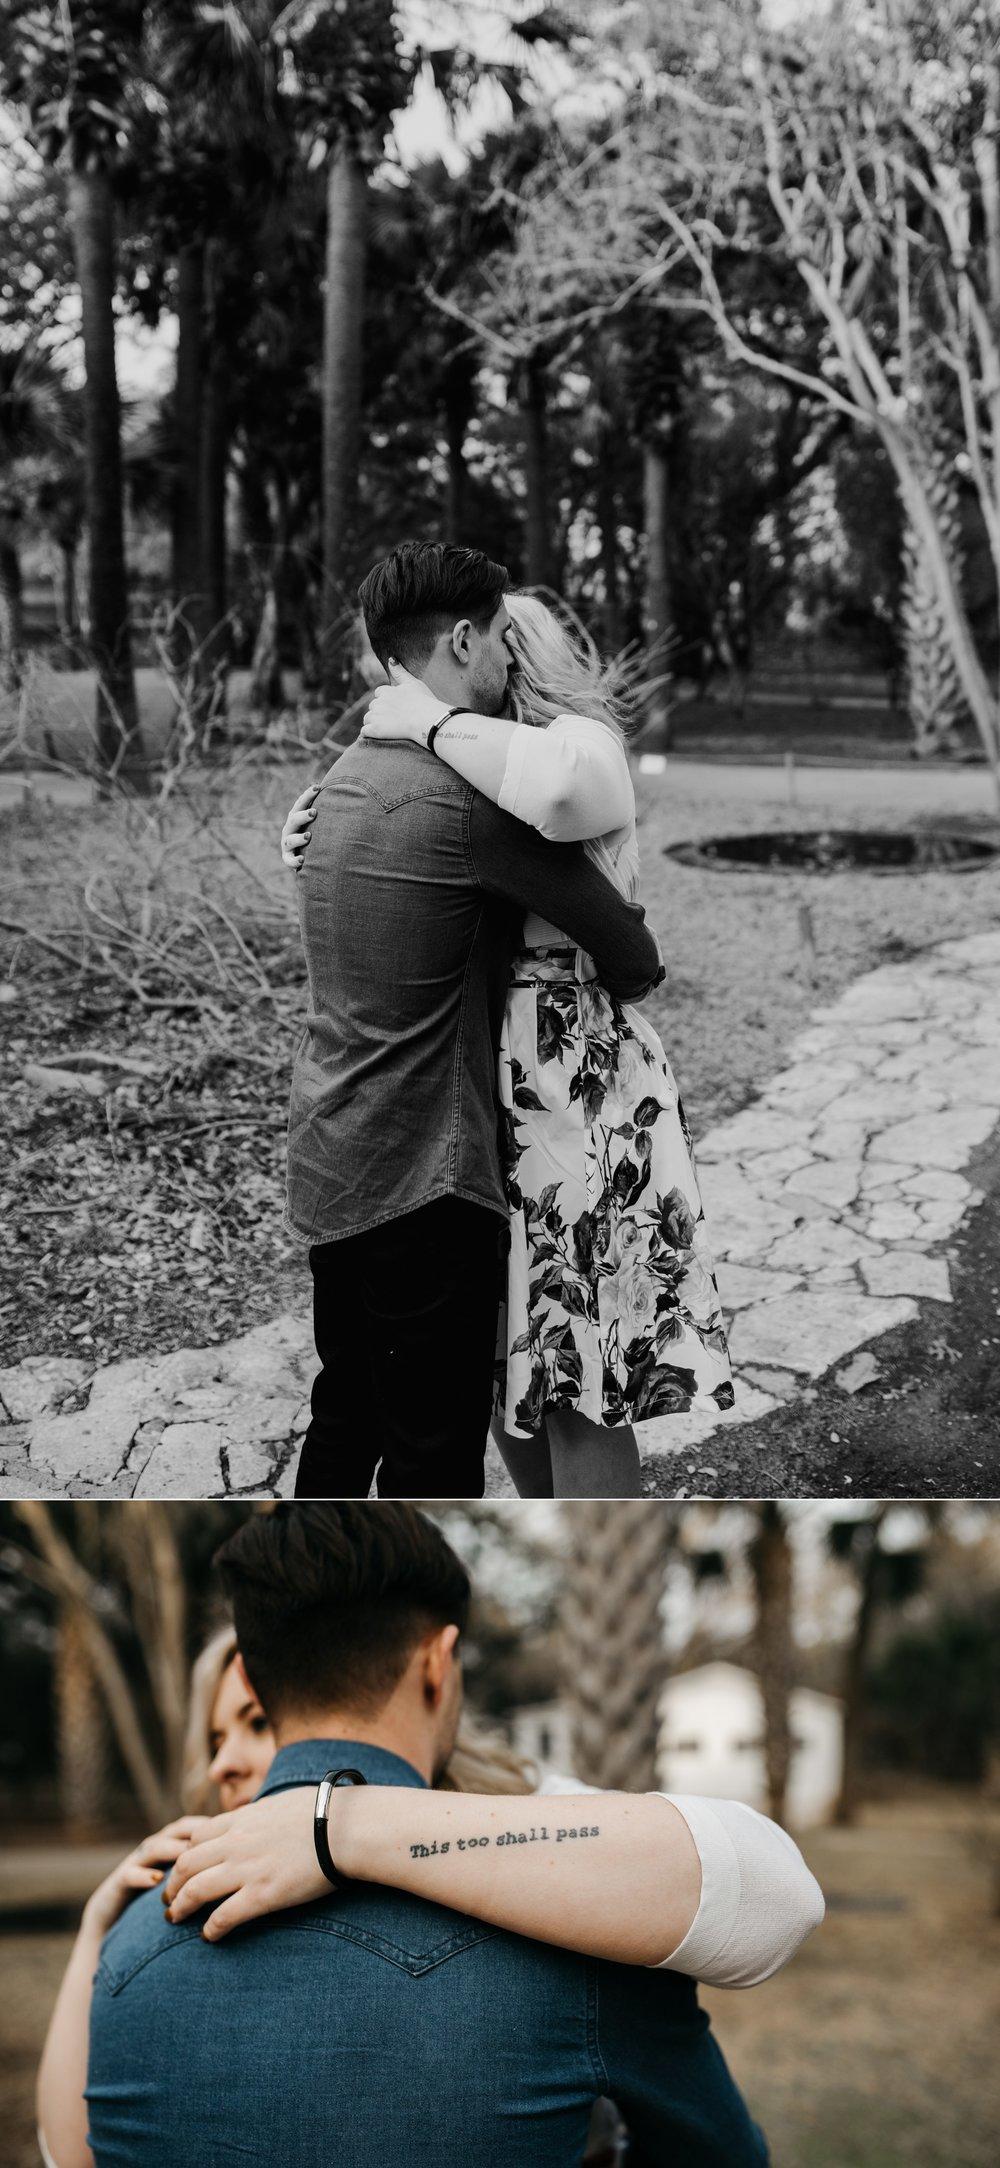 drew-andrew-texas-austin-minnesota-minneapolis-wedding-photographer-destination-elopement-intimate-adventurous_0104.jpg